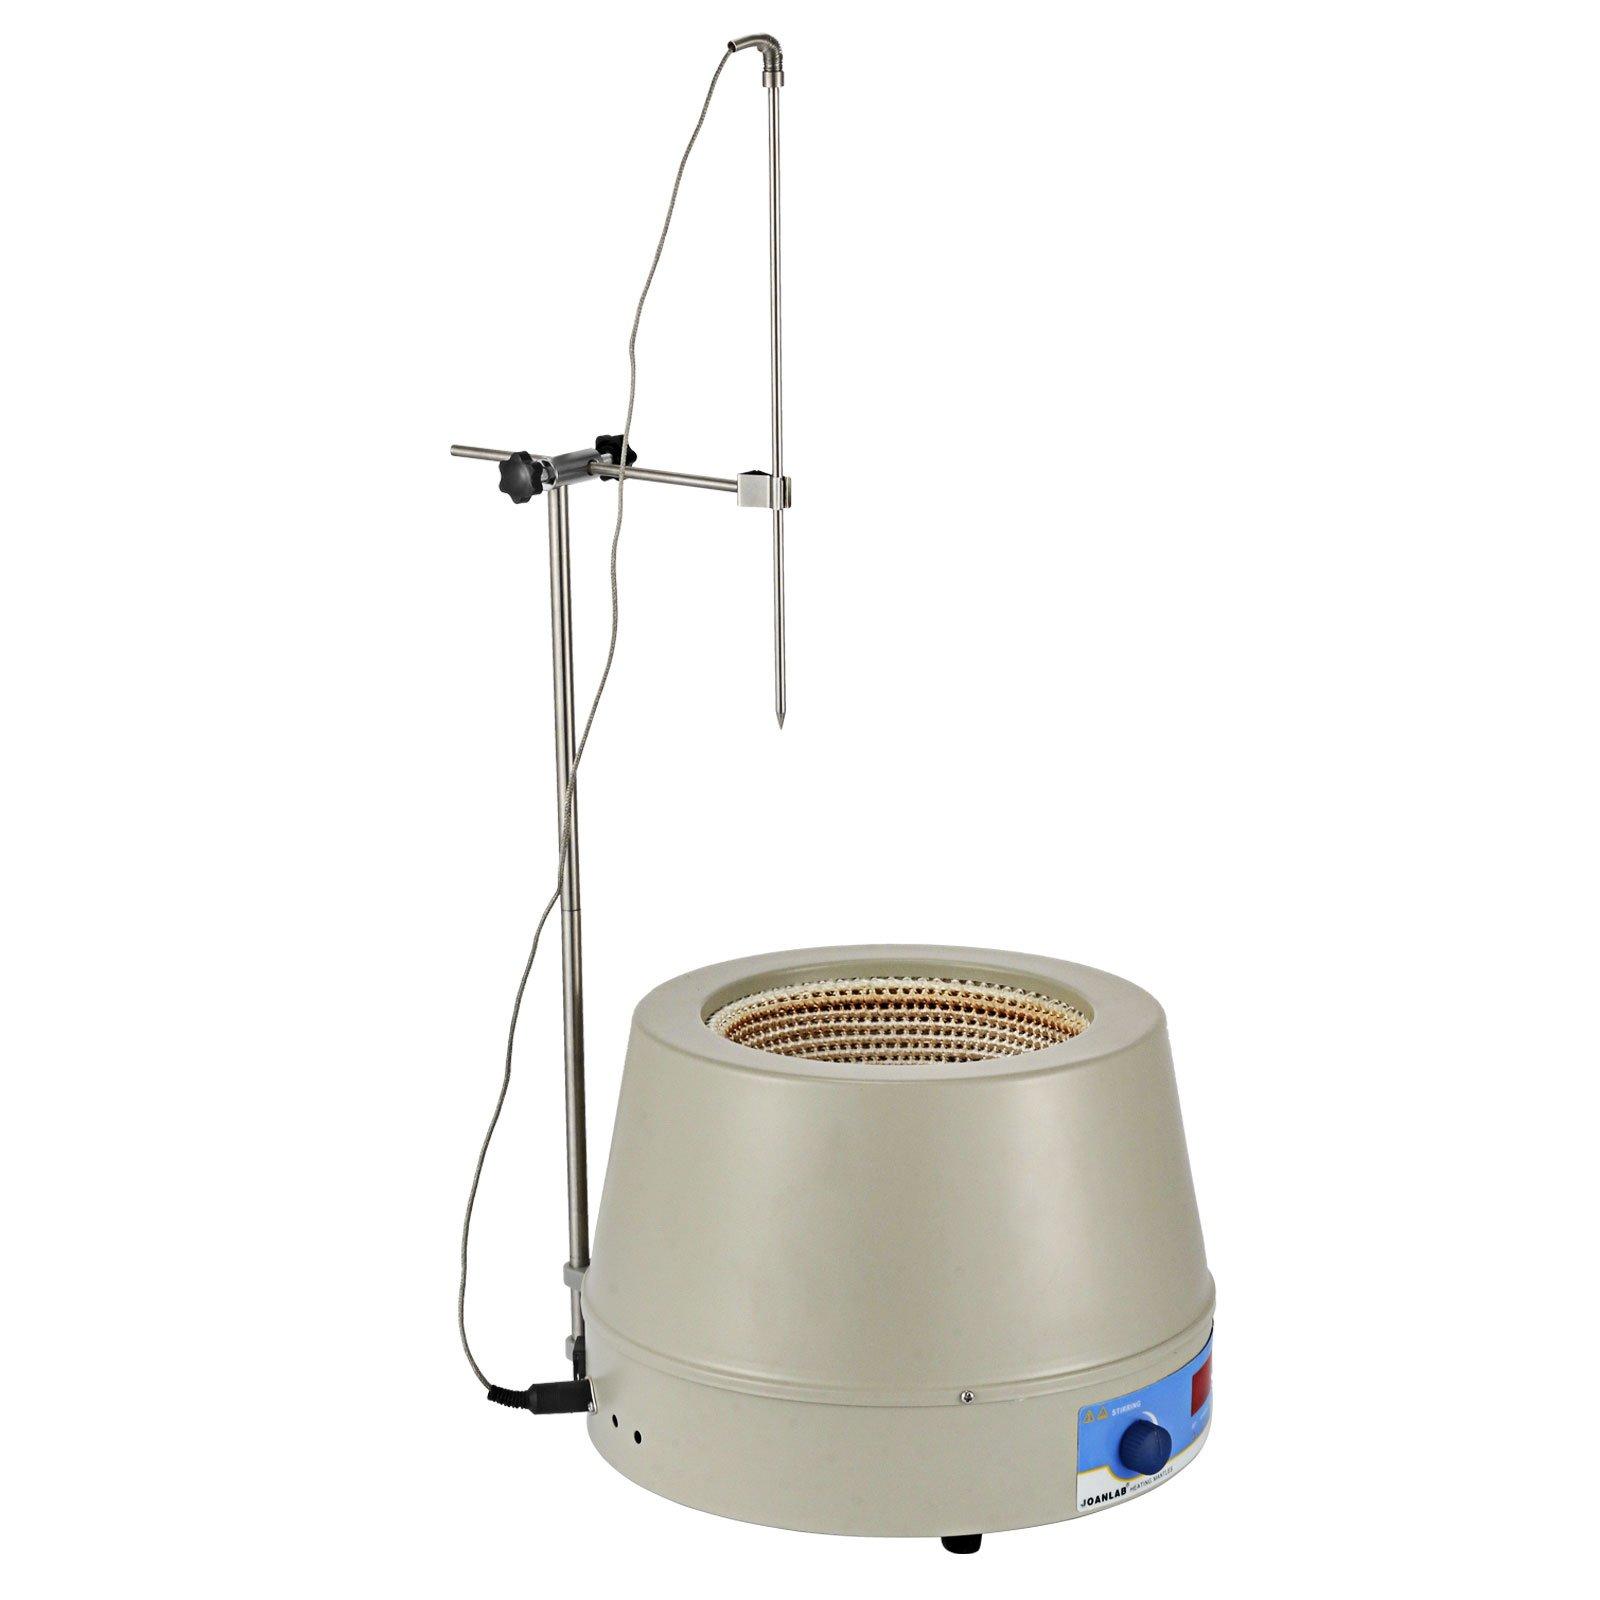 Happybuy Magnetic Stirrer 1400RPM Magnetic Mixer 1000ml Magnetic Stirrer Hot Plate 350W Magnetic Heating Mantle Digital Display Magnetic Stirrer Round Bottom